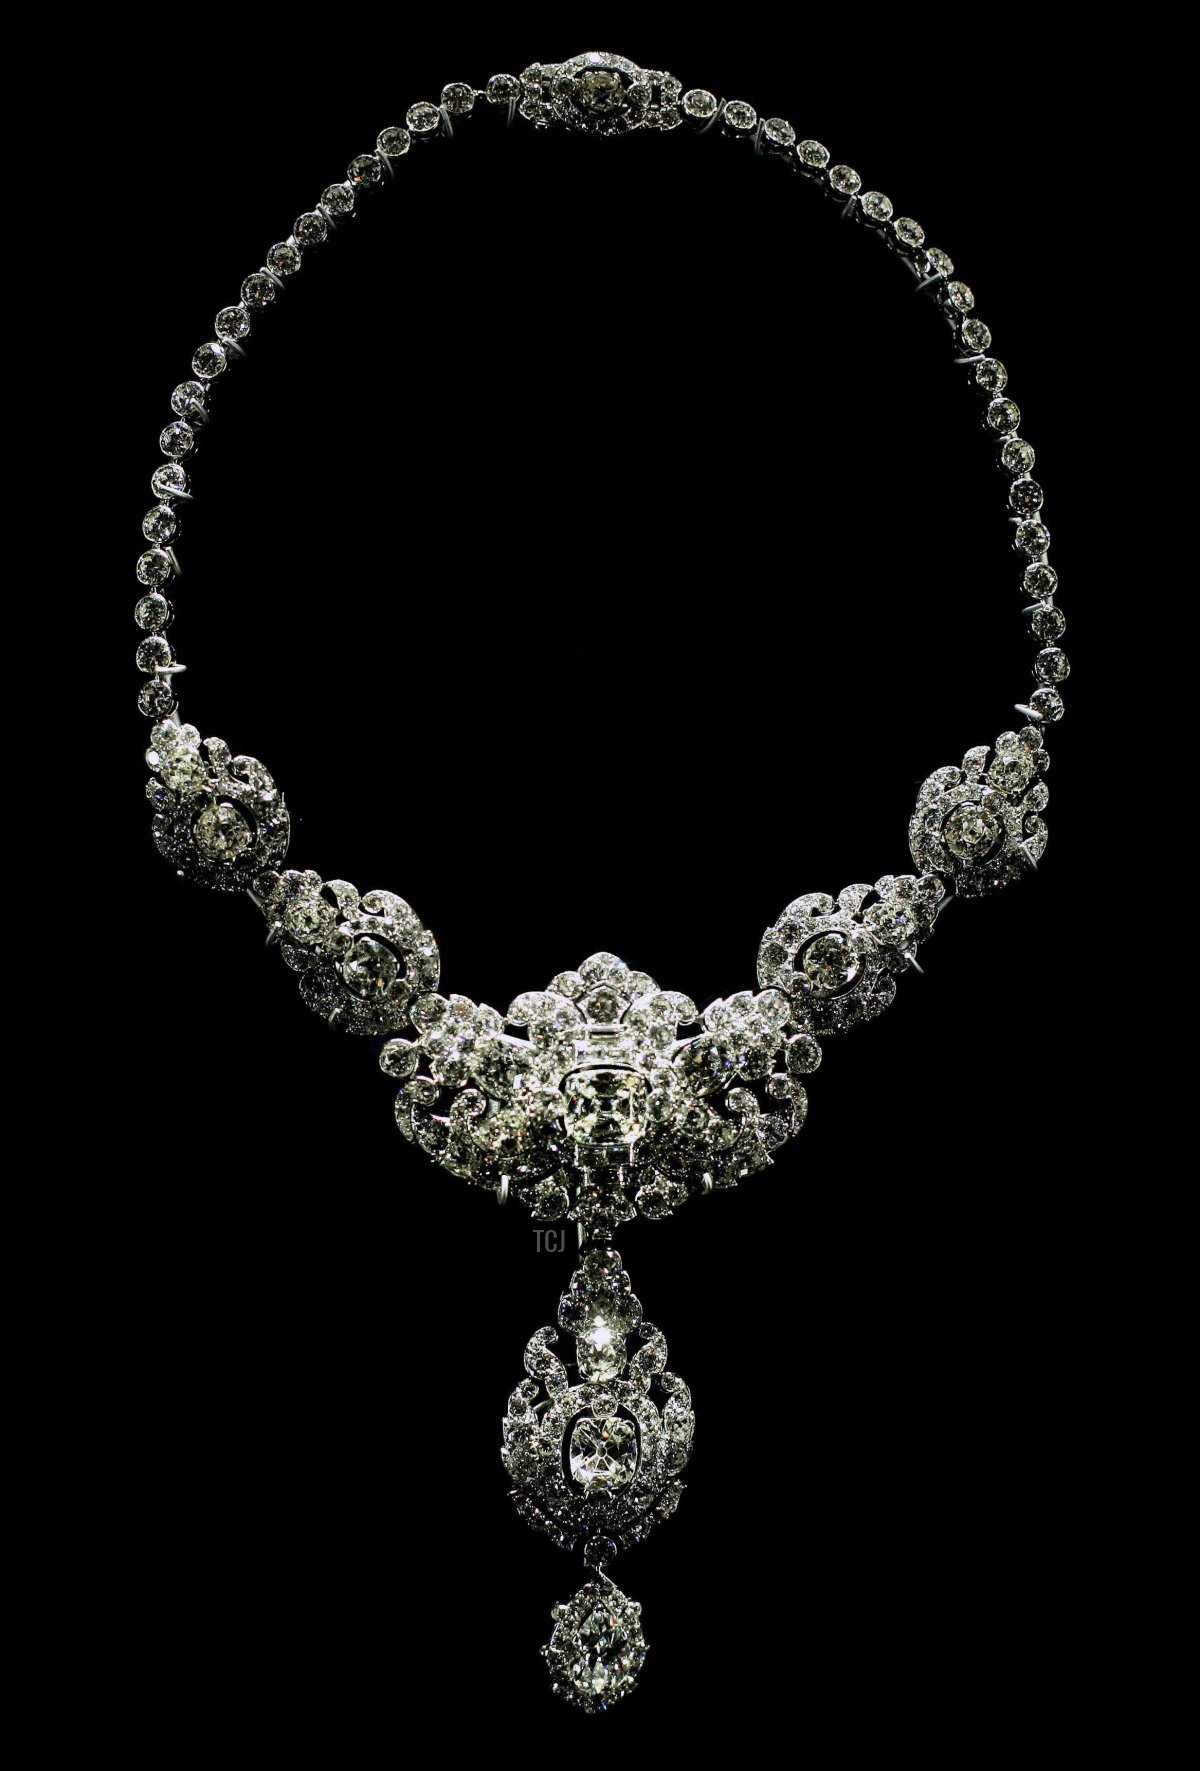 The Nizam of Hyderabad Necklace